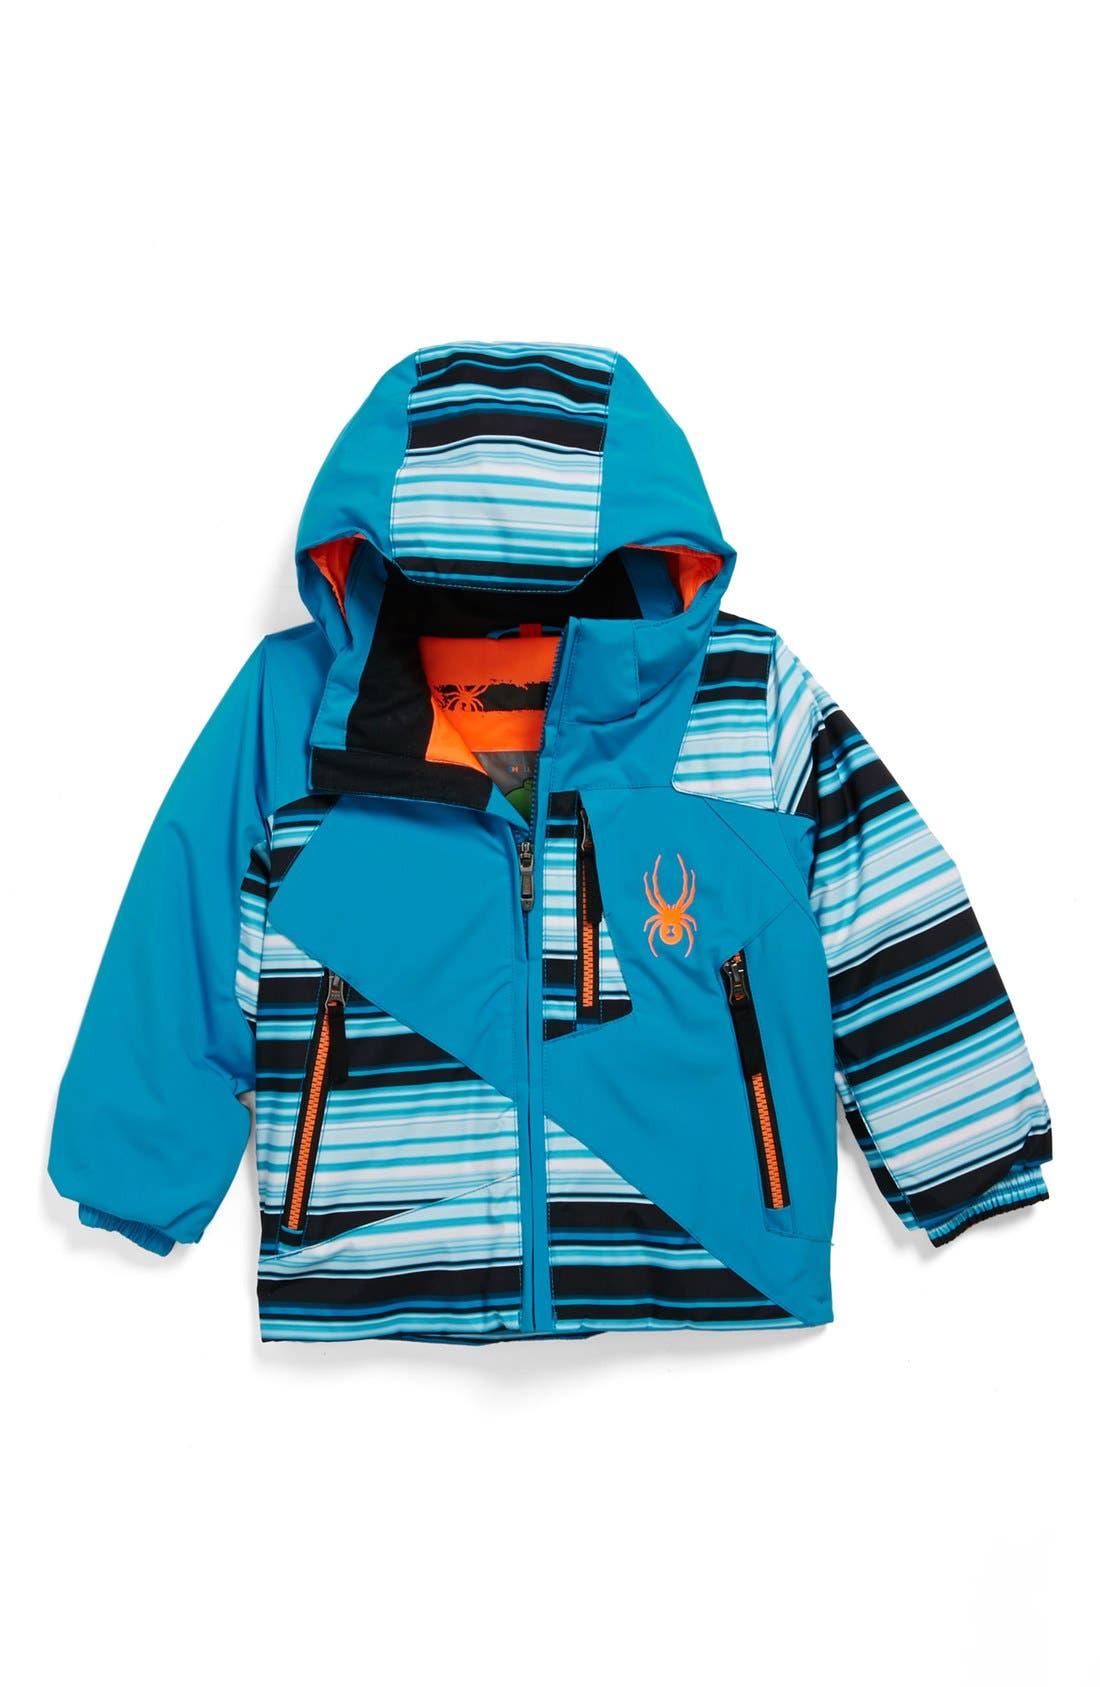 Alternate Image 1 Selected - Spyder 'Armageddon' Waterproof Snow Jacket (Little Boys)